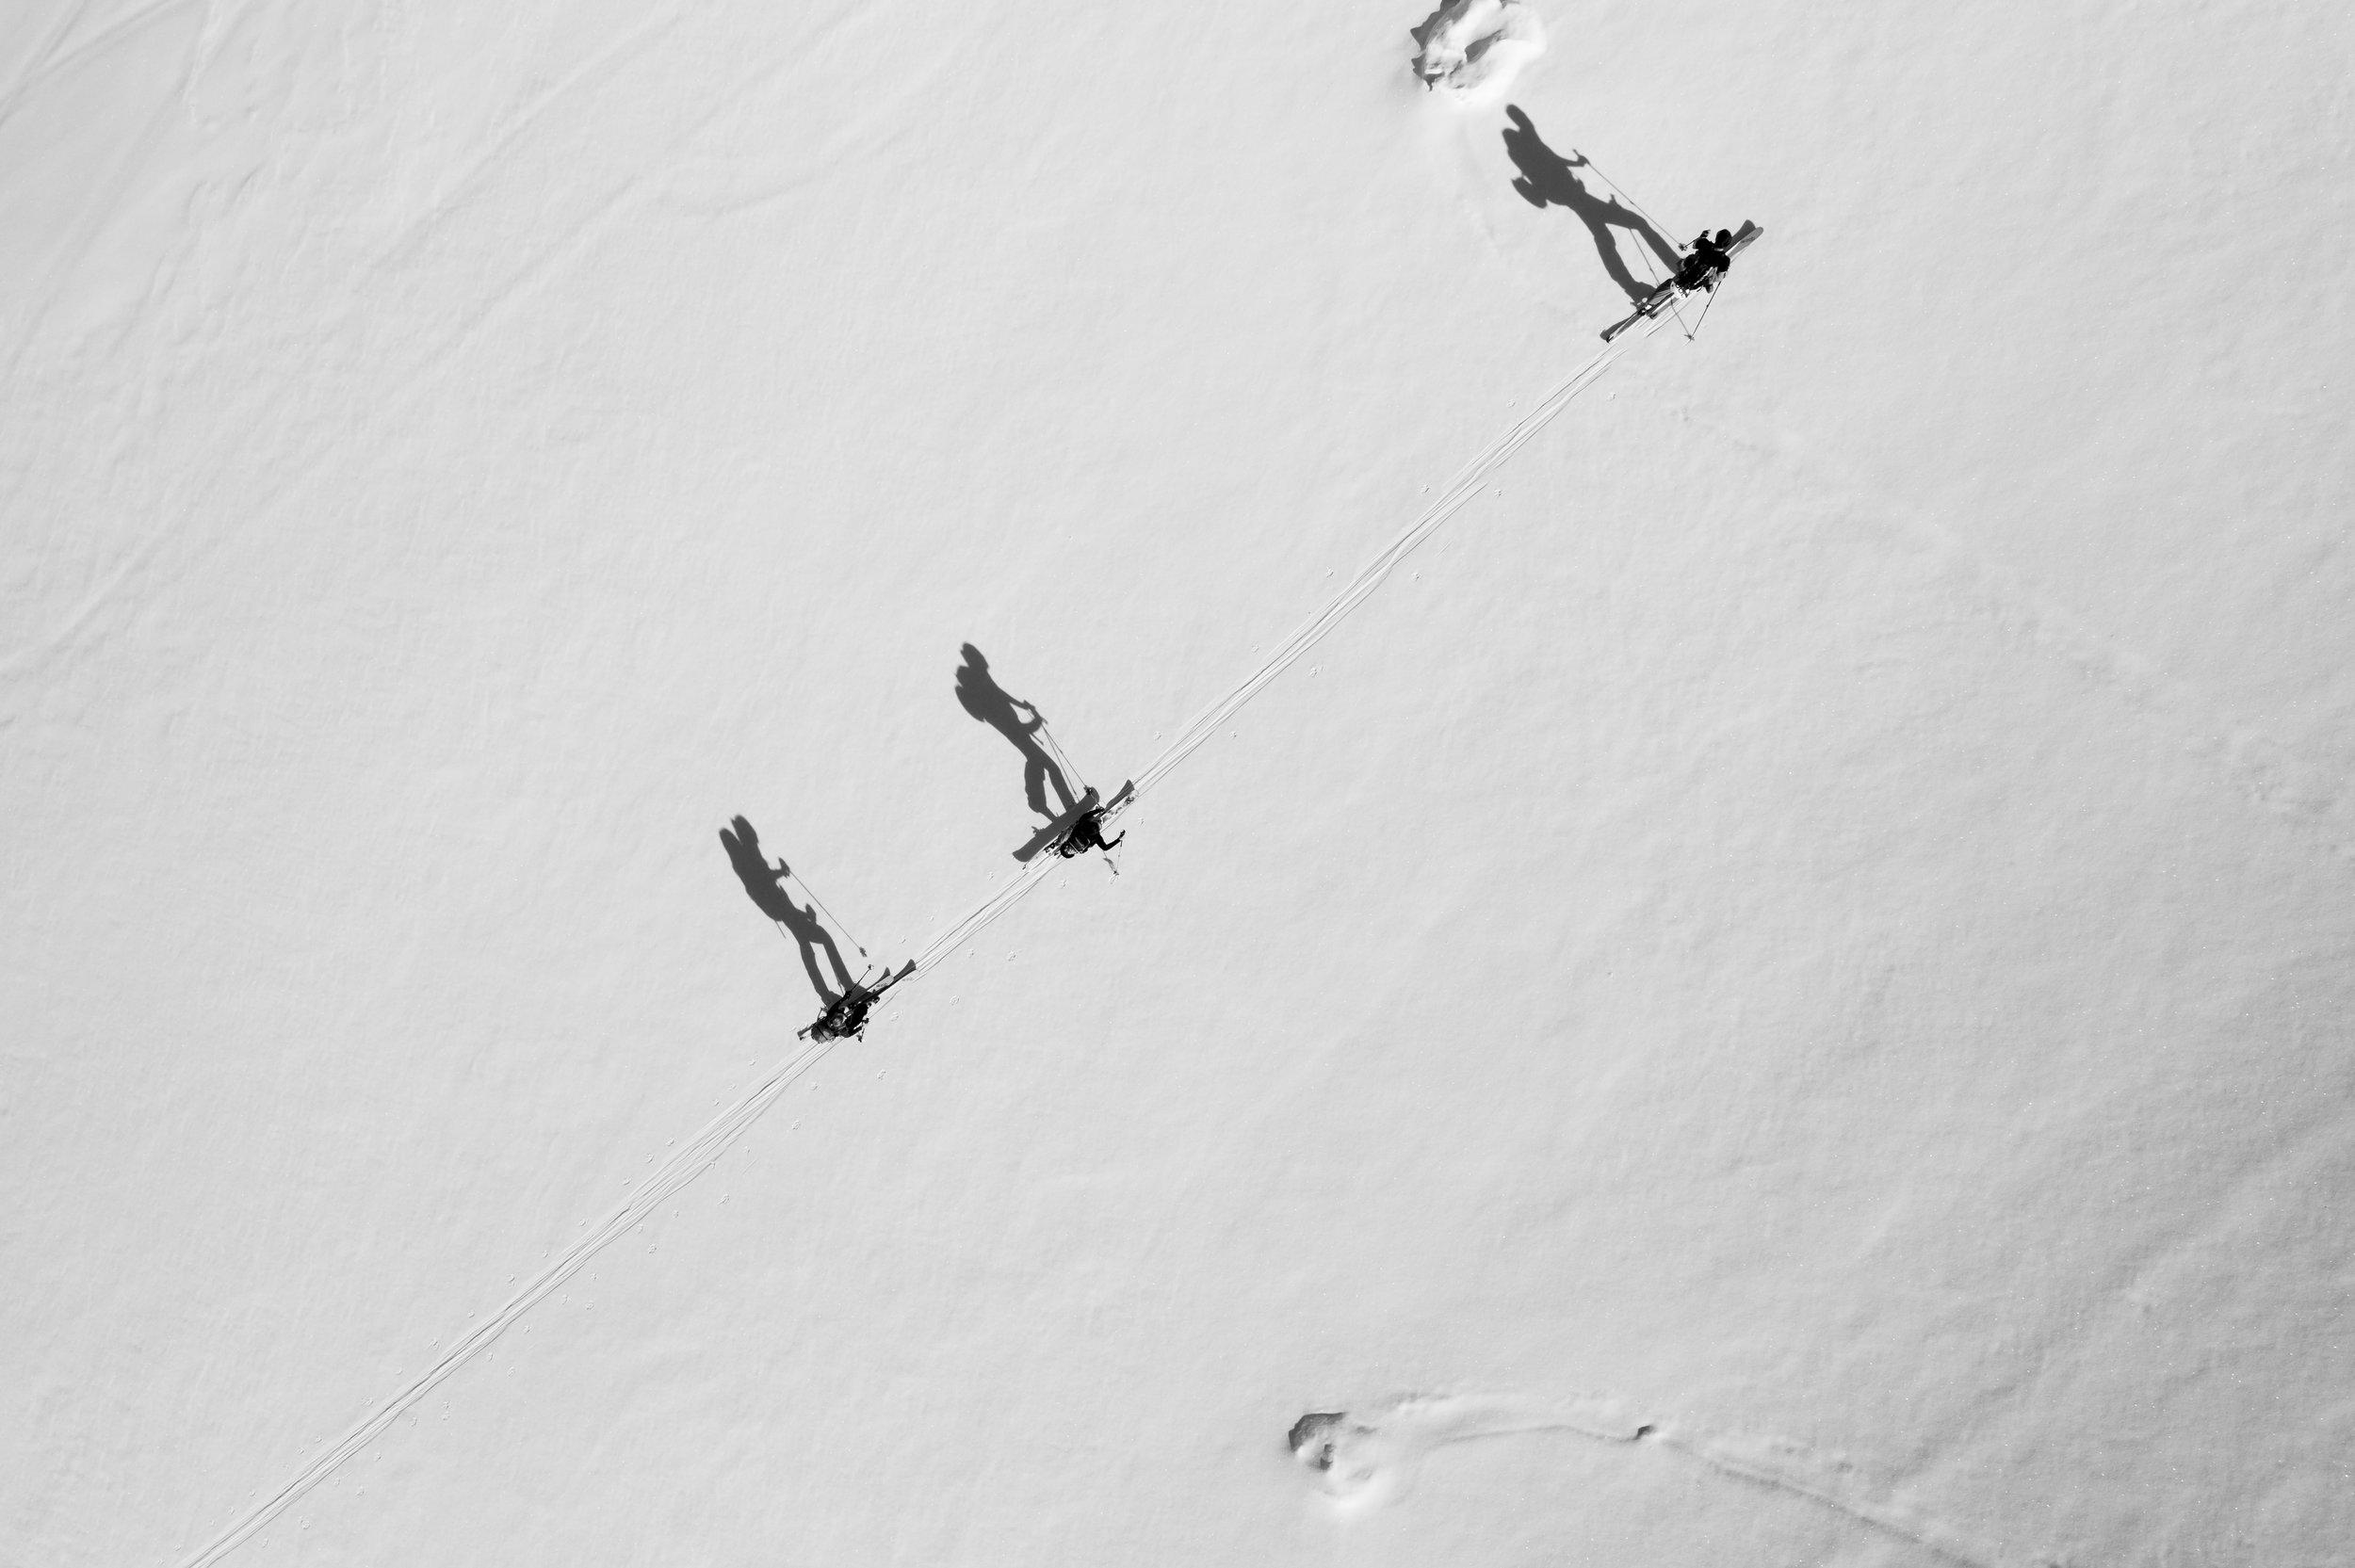 ORIGPLUS_backcountry-image_01_Christoph-Oberschneider.jpg